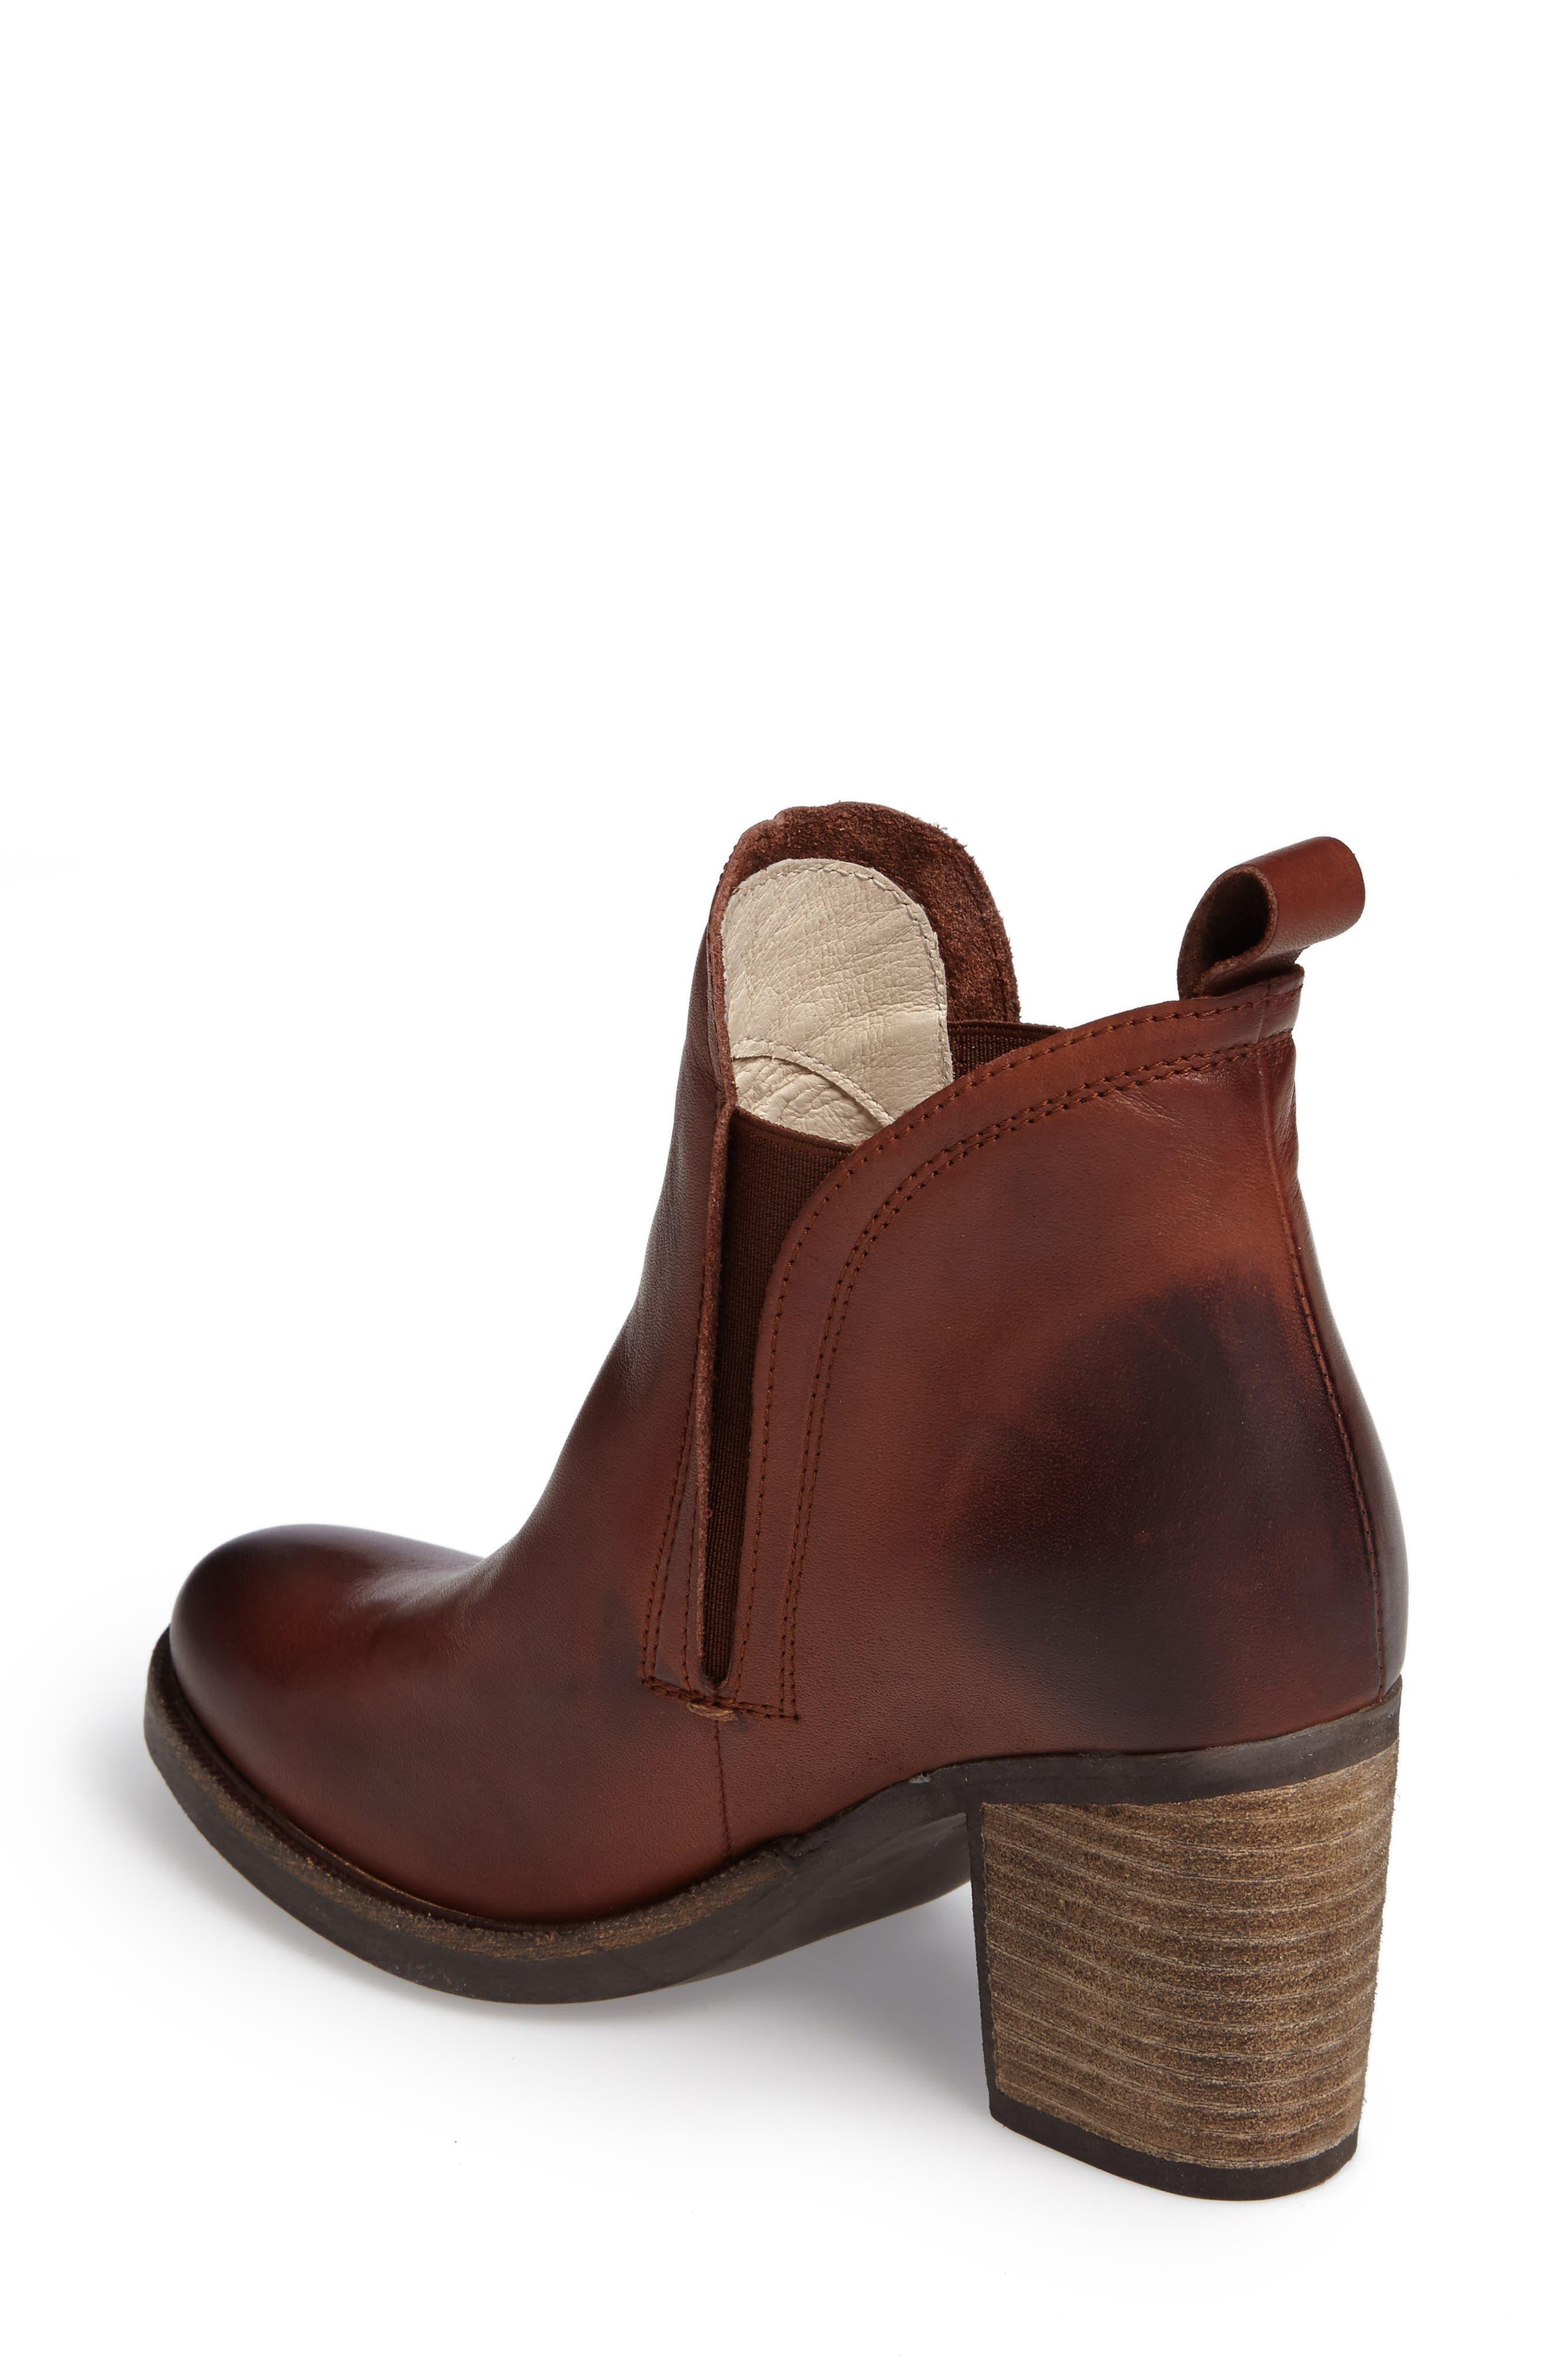 Belfielding Waterproof Chelsea Boot,                             Alternate thumbnail 7, color,